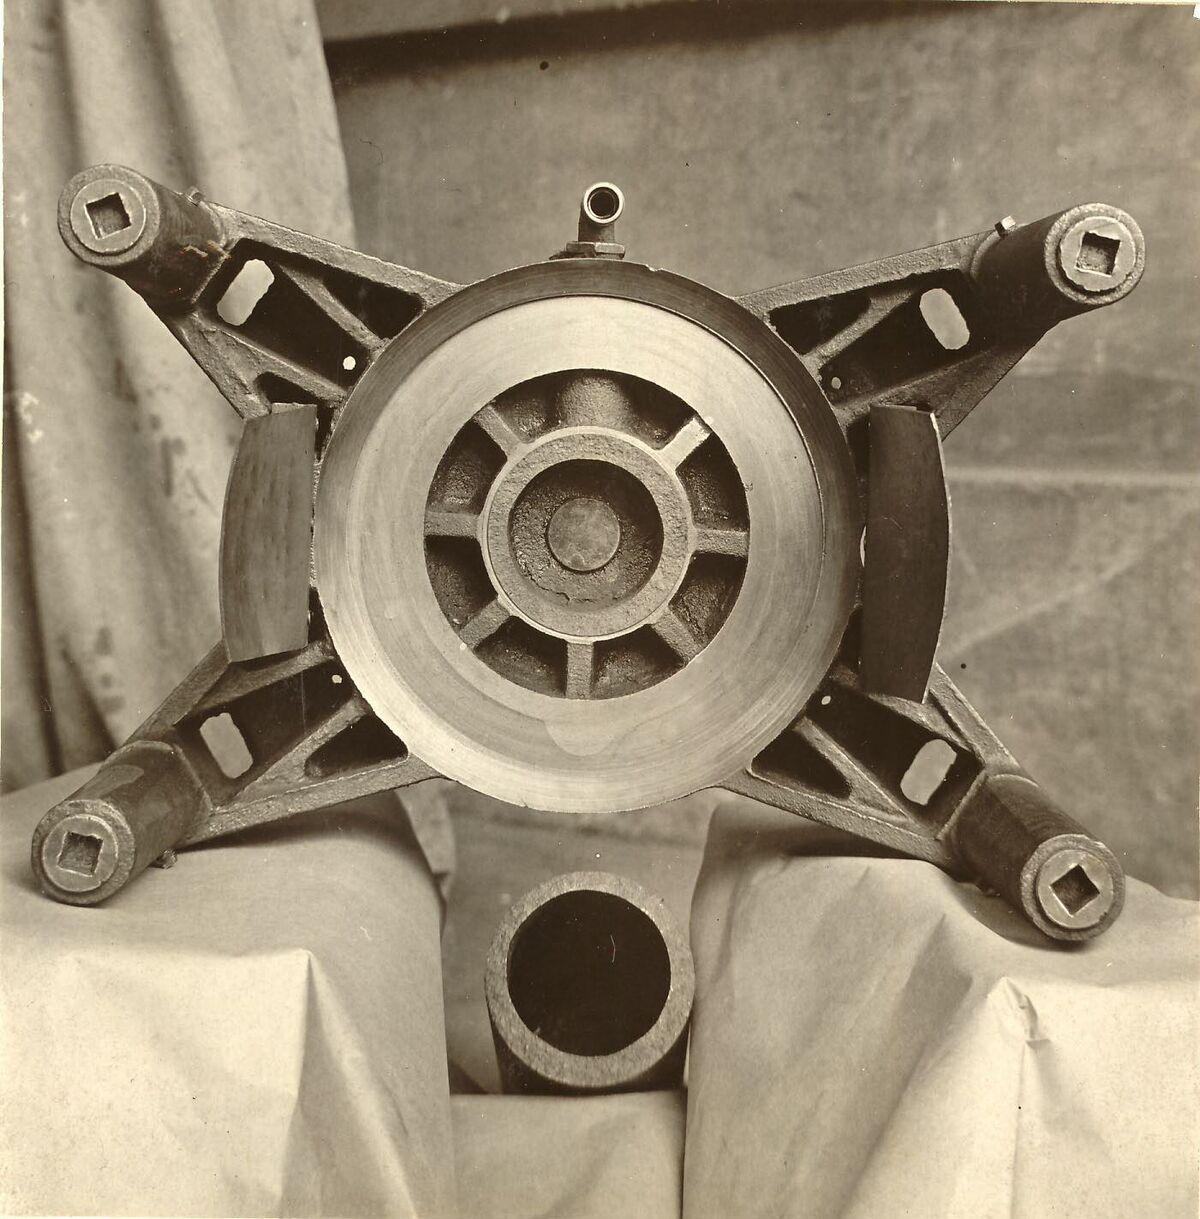 GFA 24/53.1191: Part of a Nicholls vibrating moulding machine